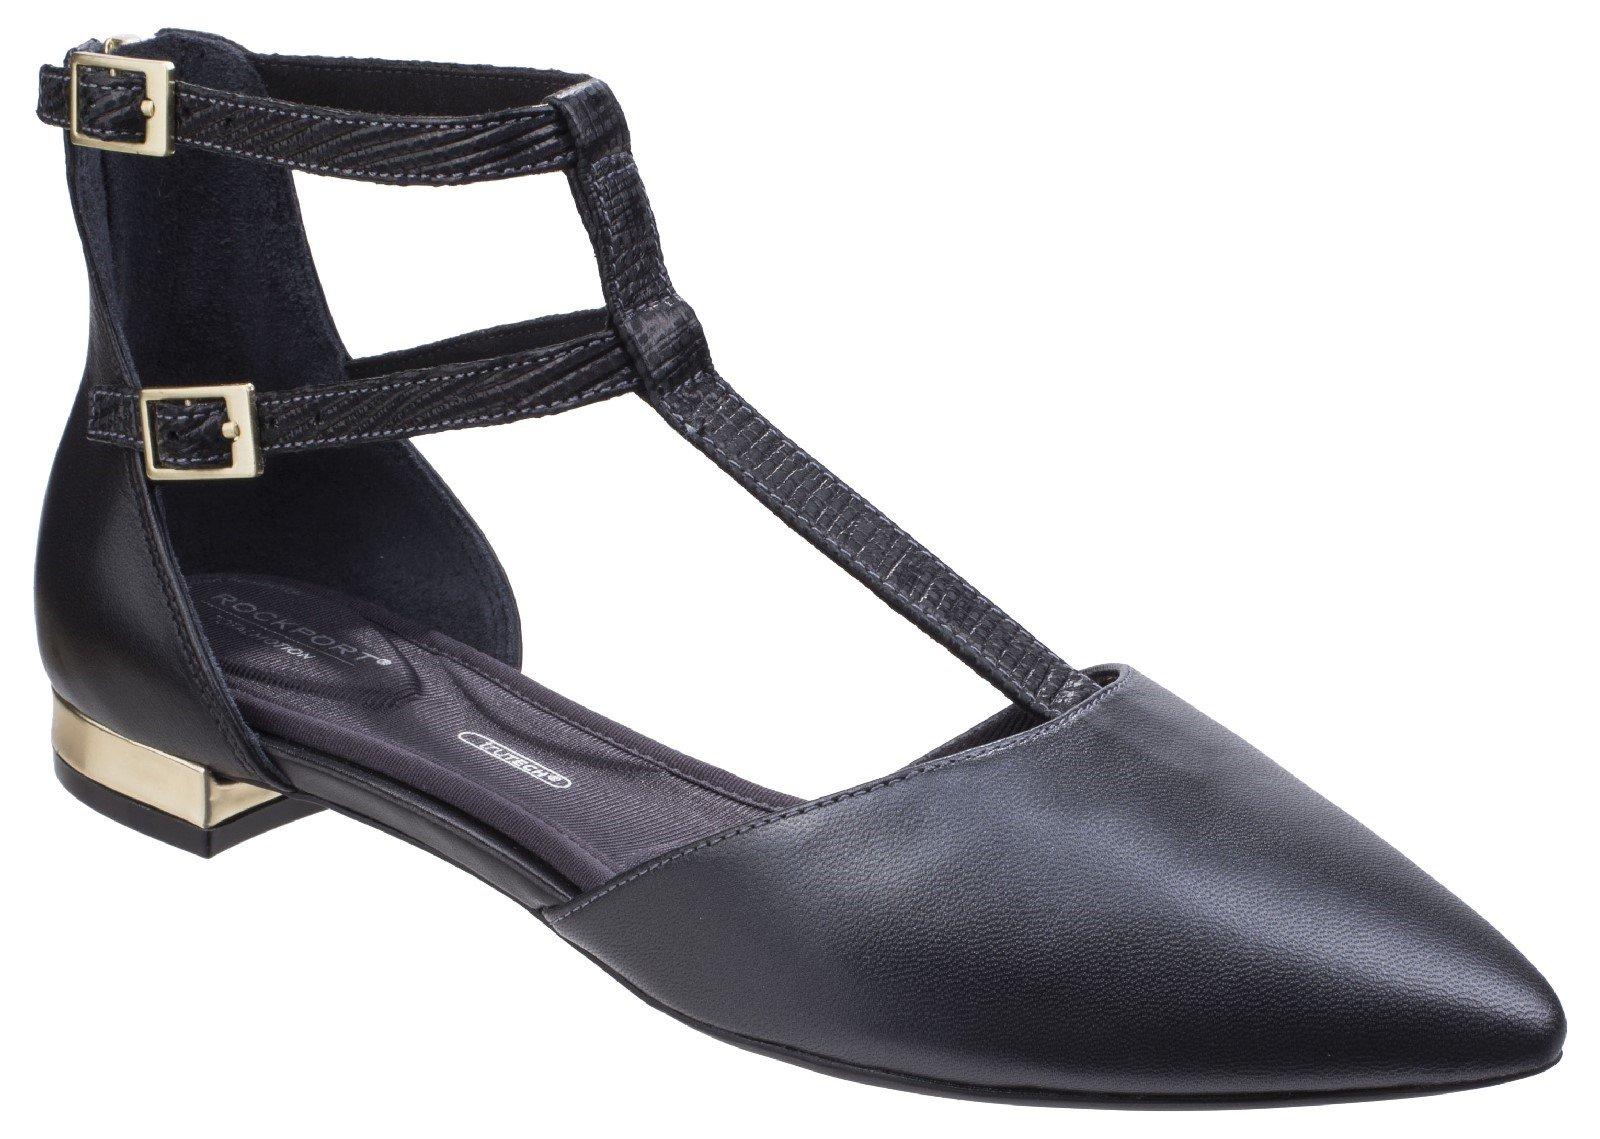 Rockport Women's Adelyn T Strap Heel Shoe Various Colours 26798 - Black 4